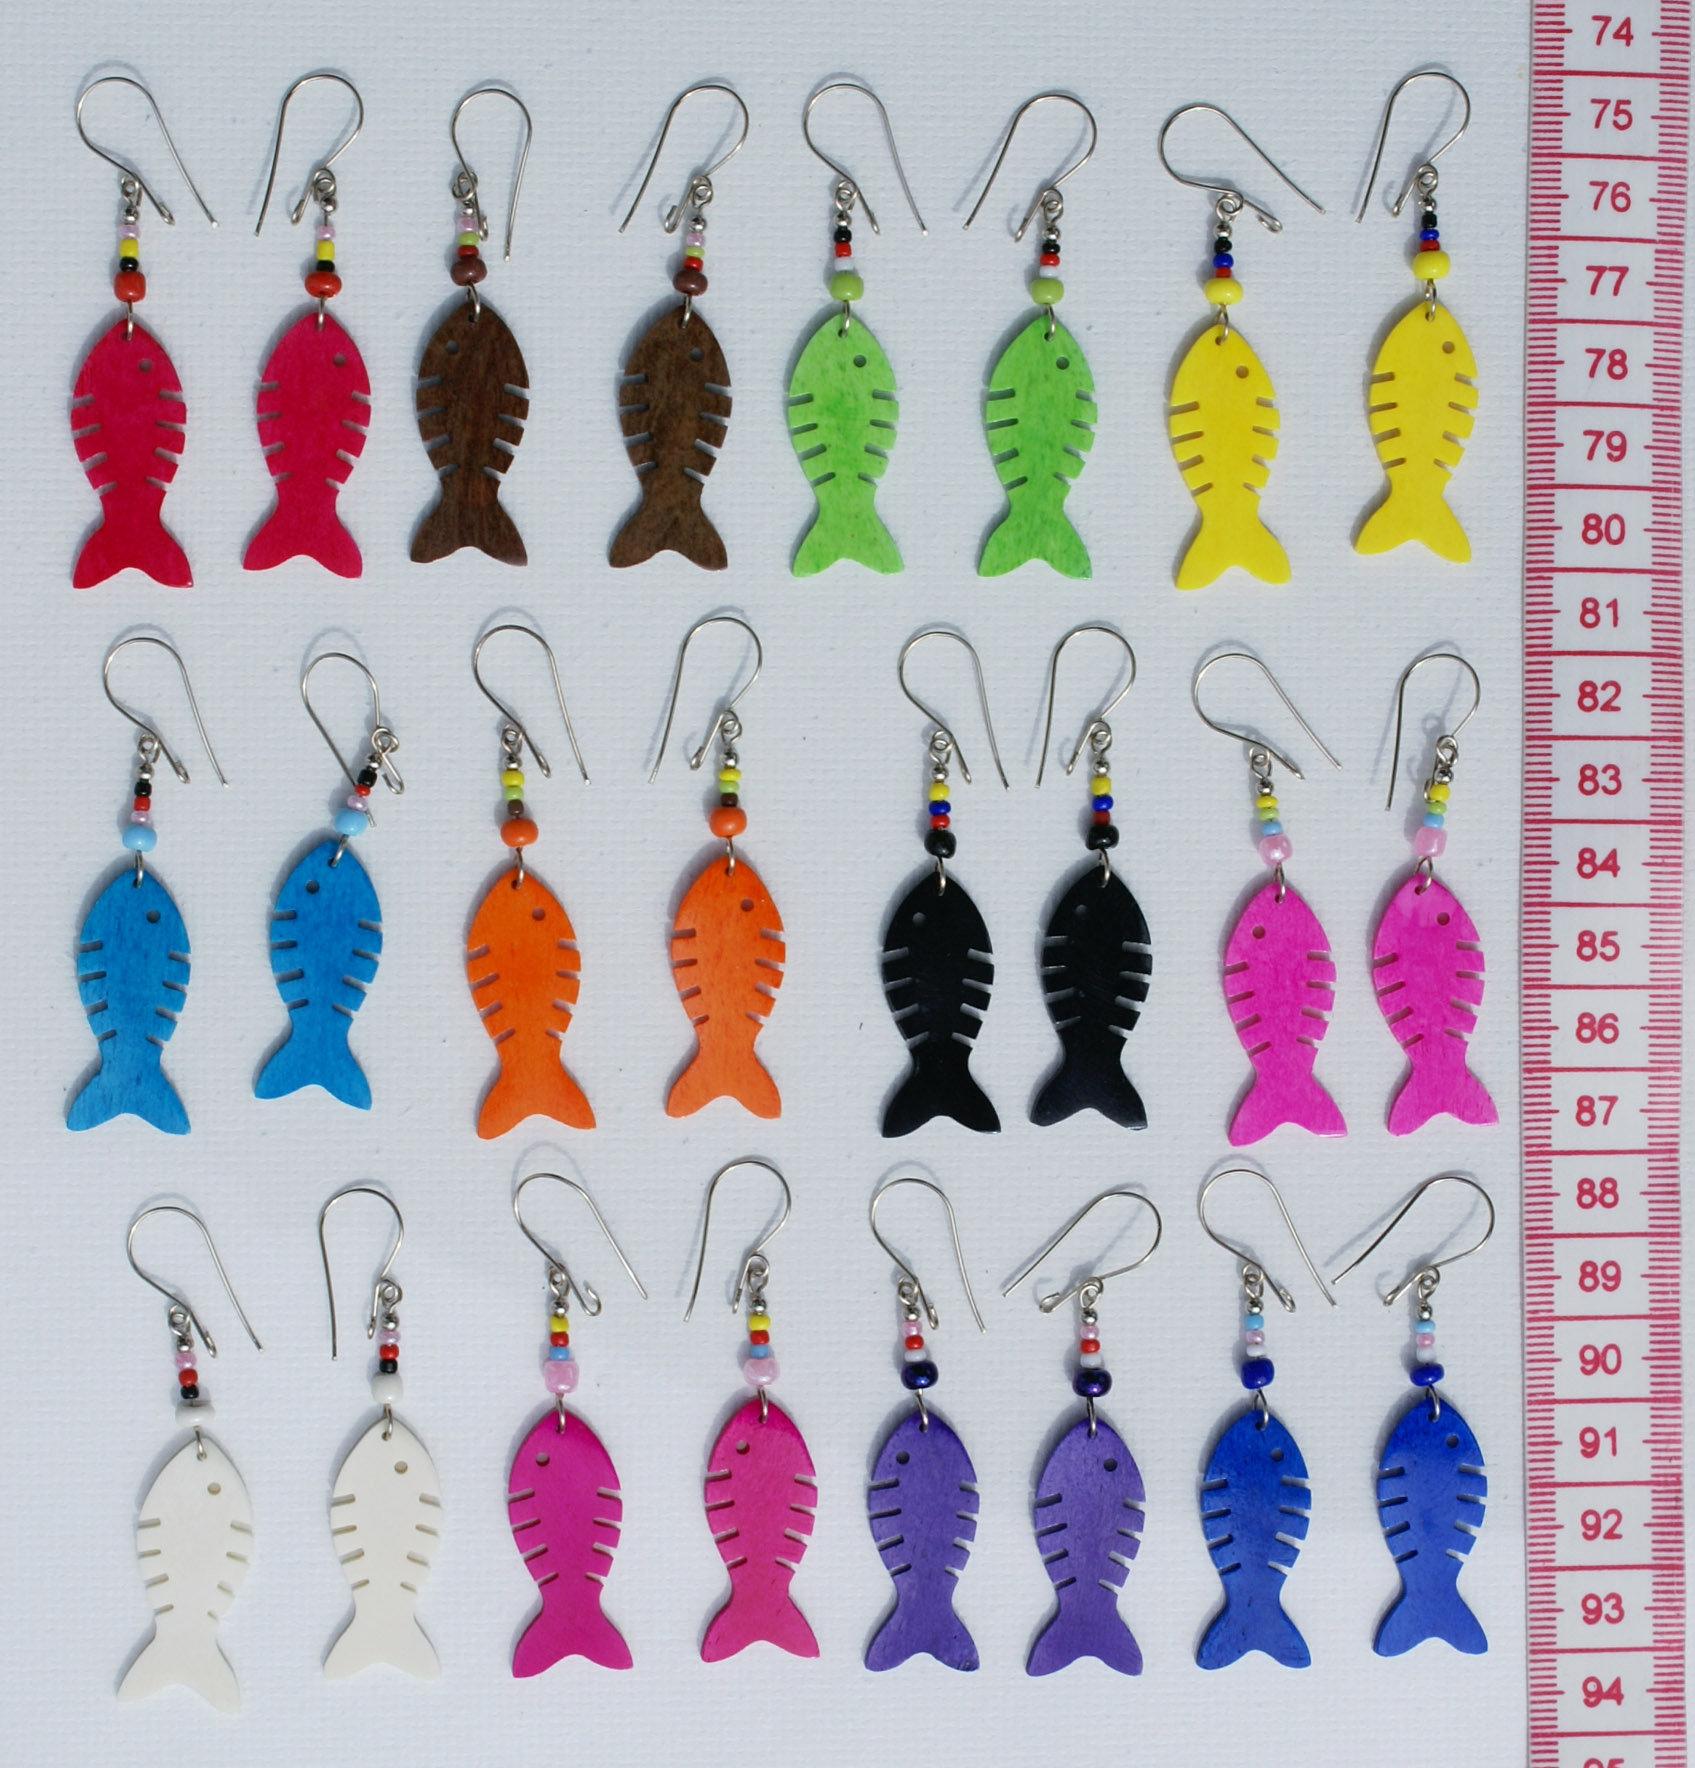 Lot12 Pairs Earrings Color Tropical Fish Ornament